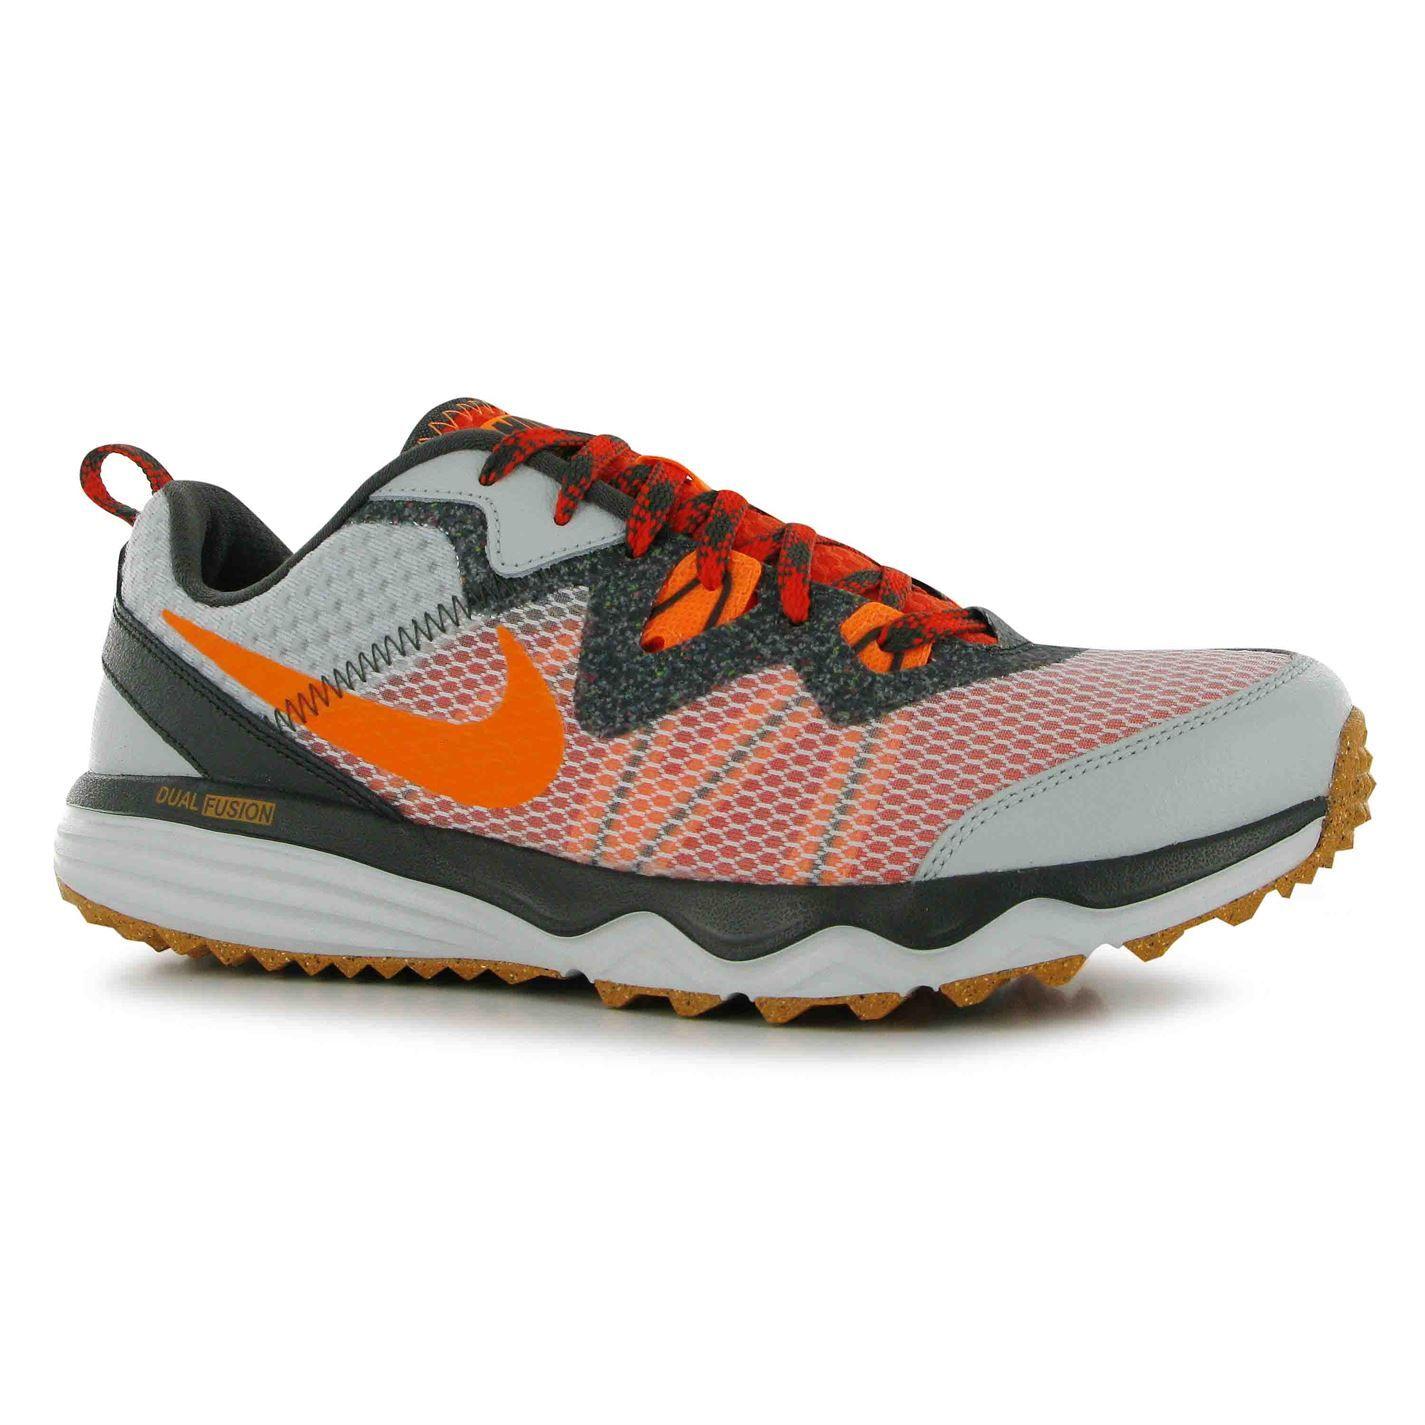 Nike Dual Fusion Men's Trail Running Shoes Grey/Orange